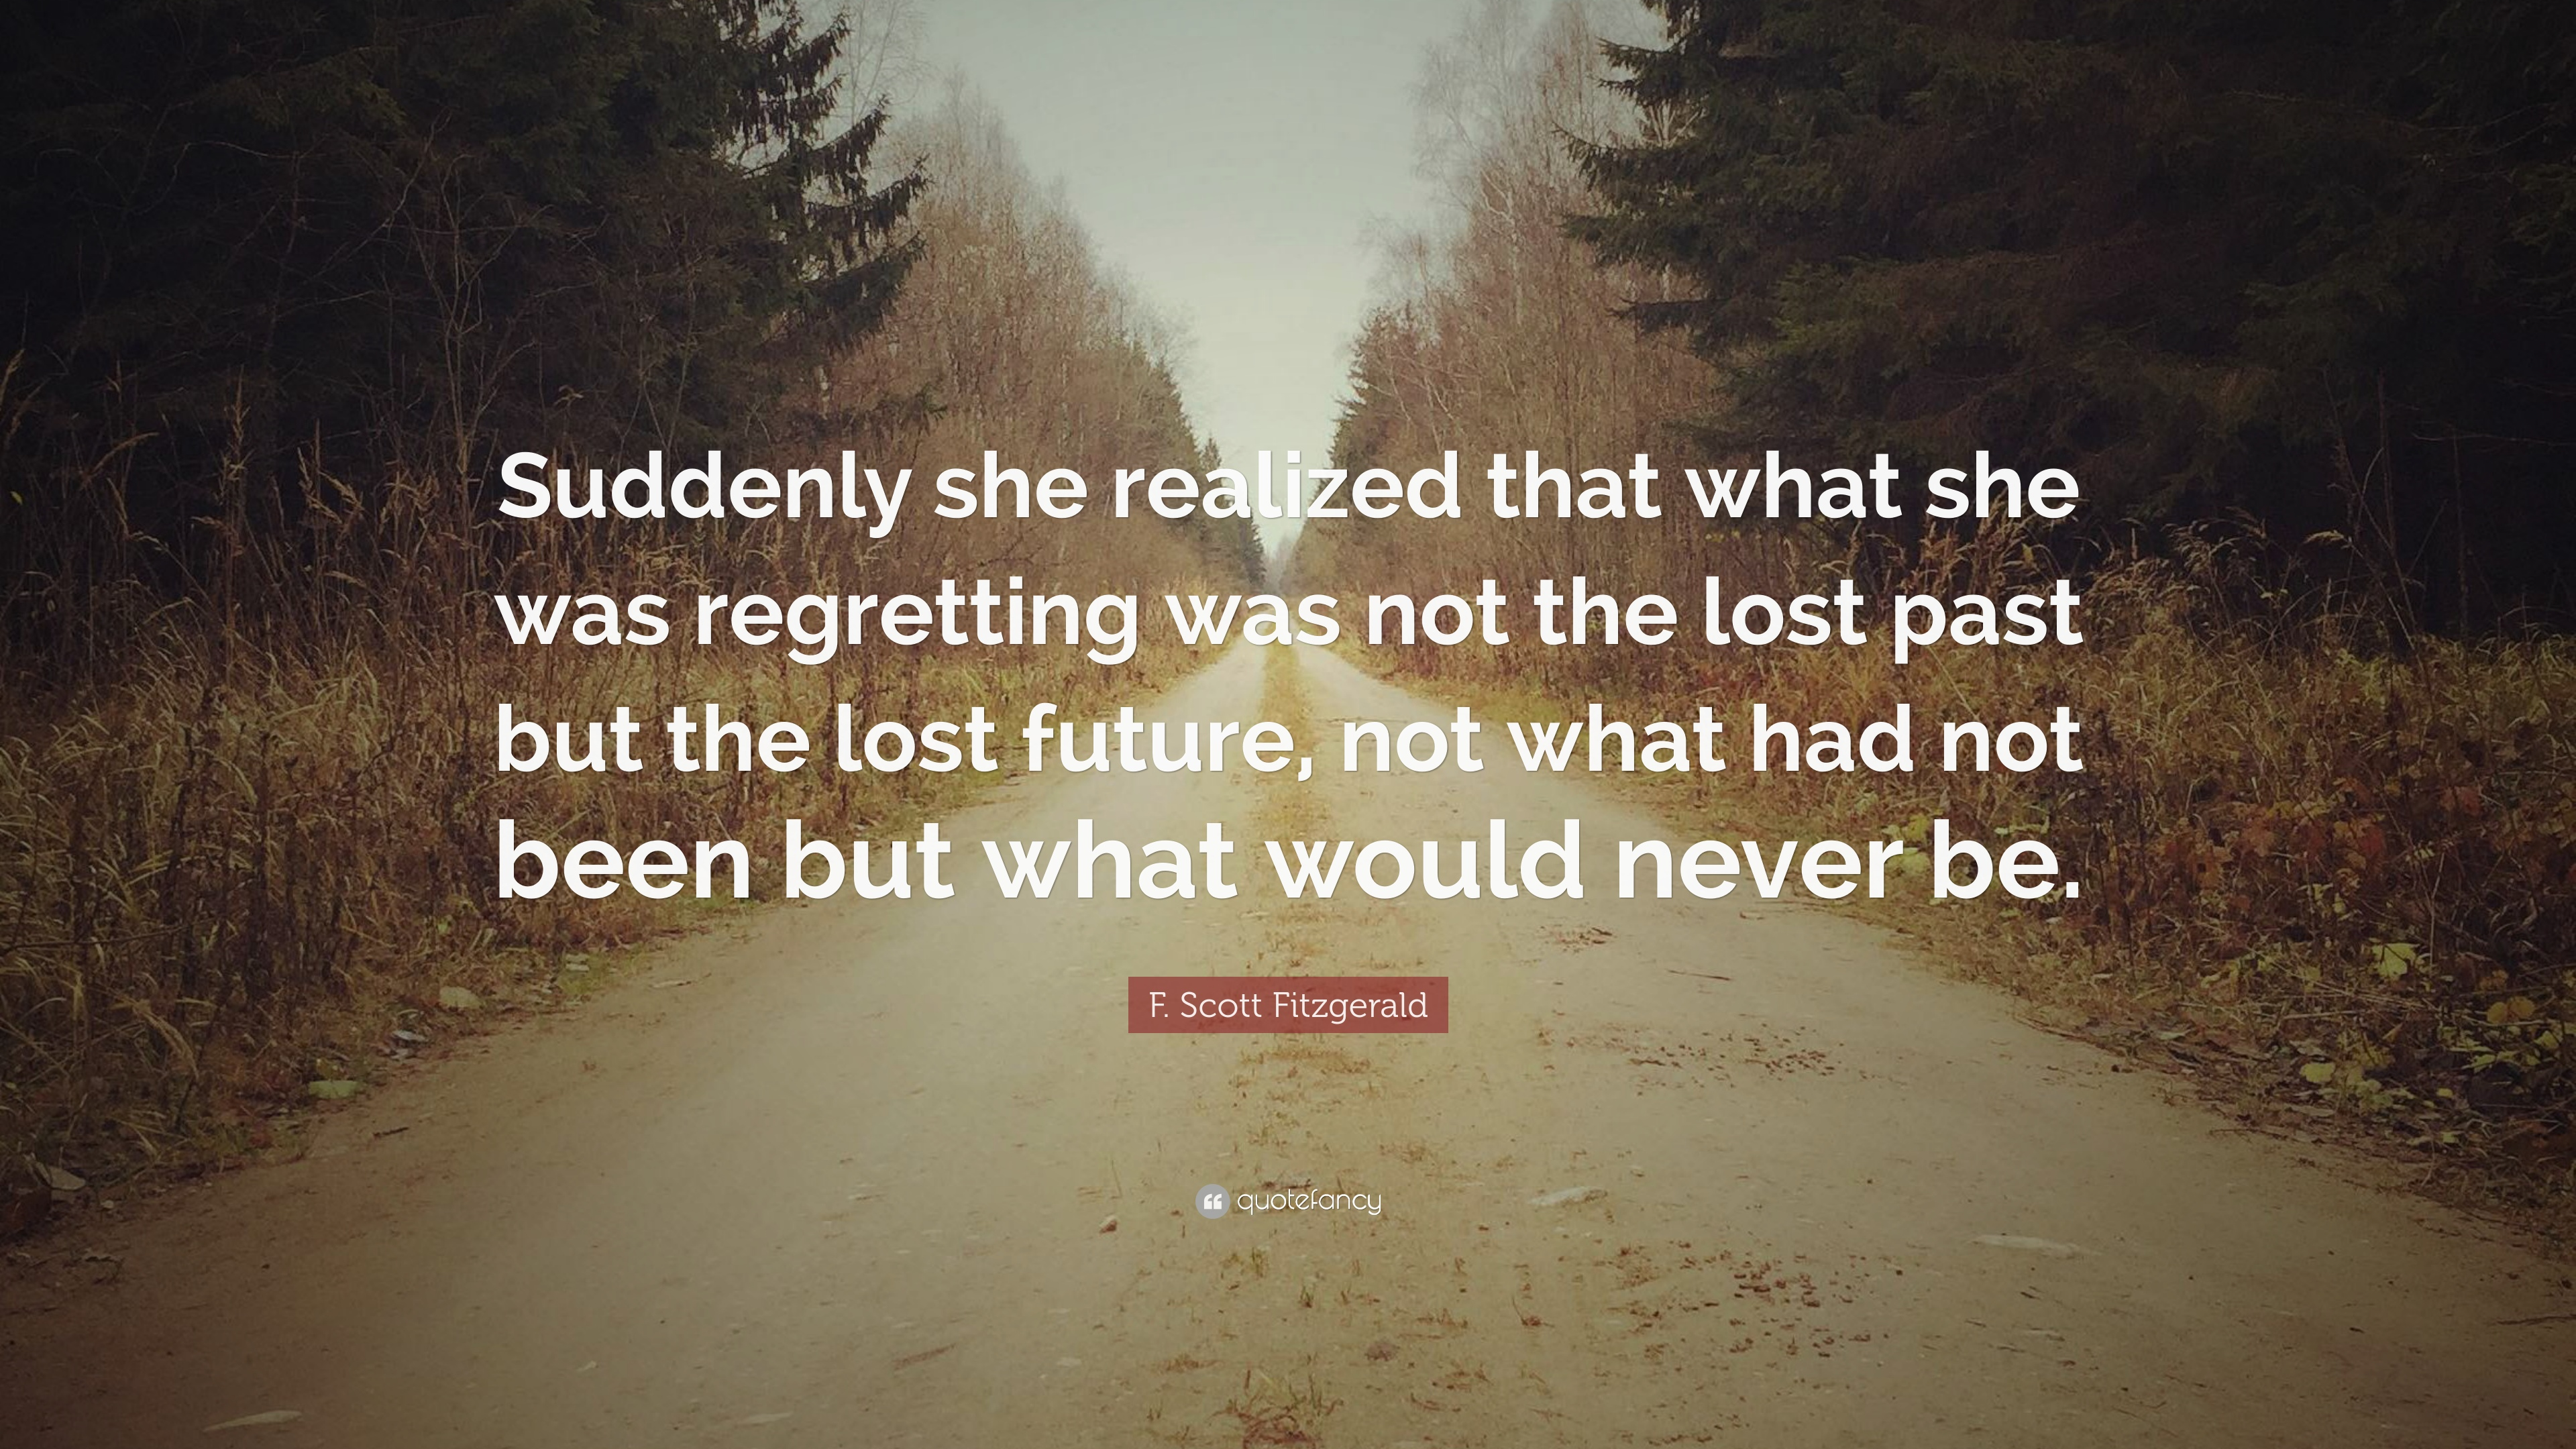 F. Scott Fitzgerald Quotes (100 Wallpapers)